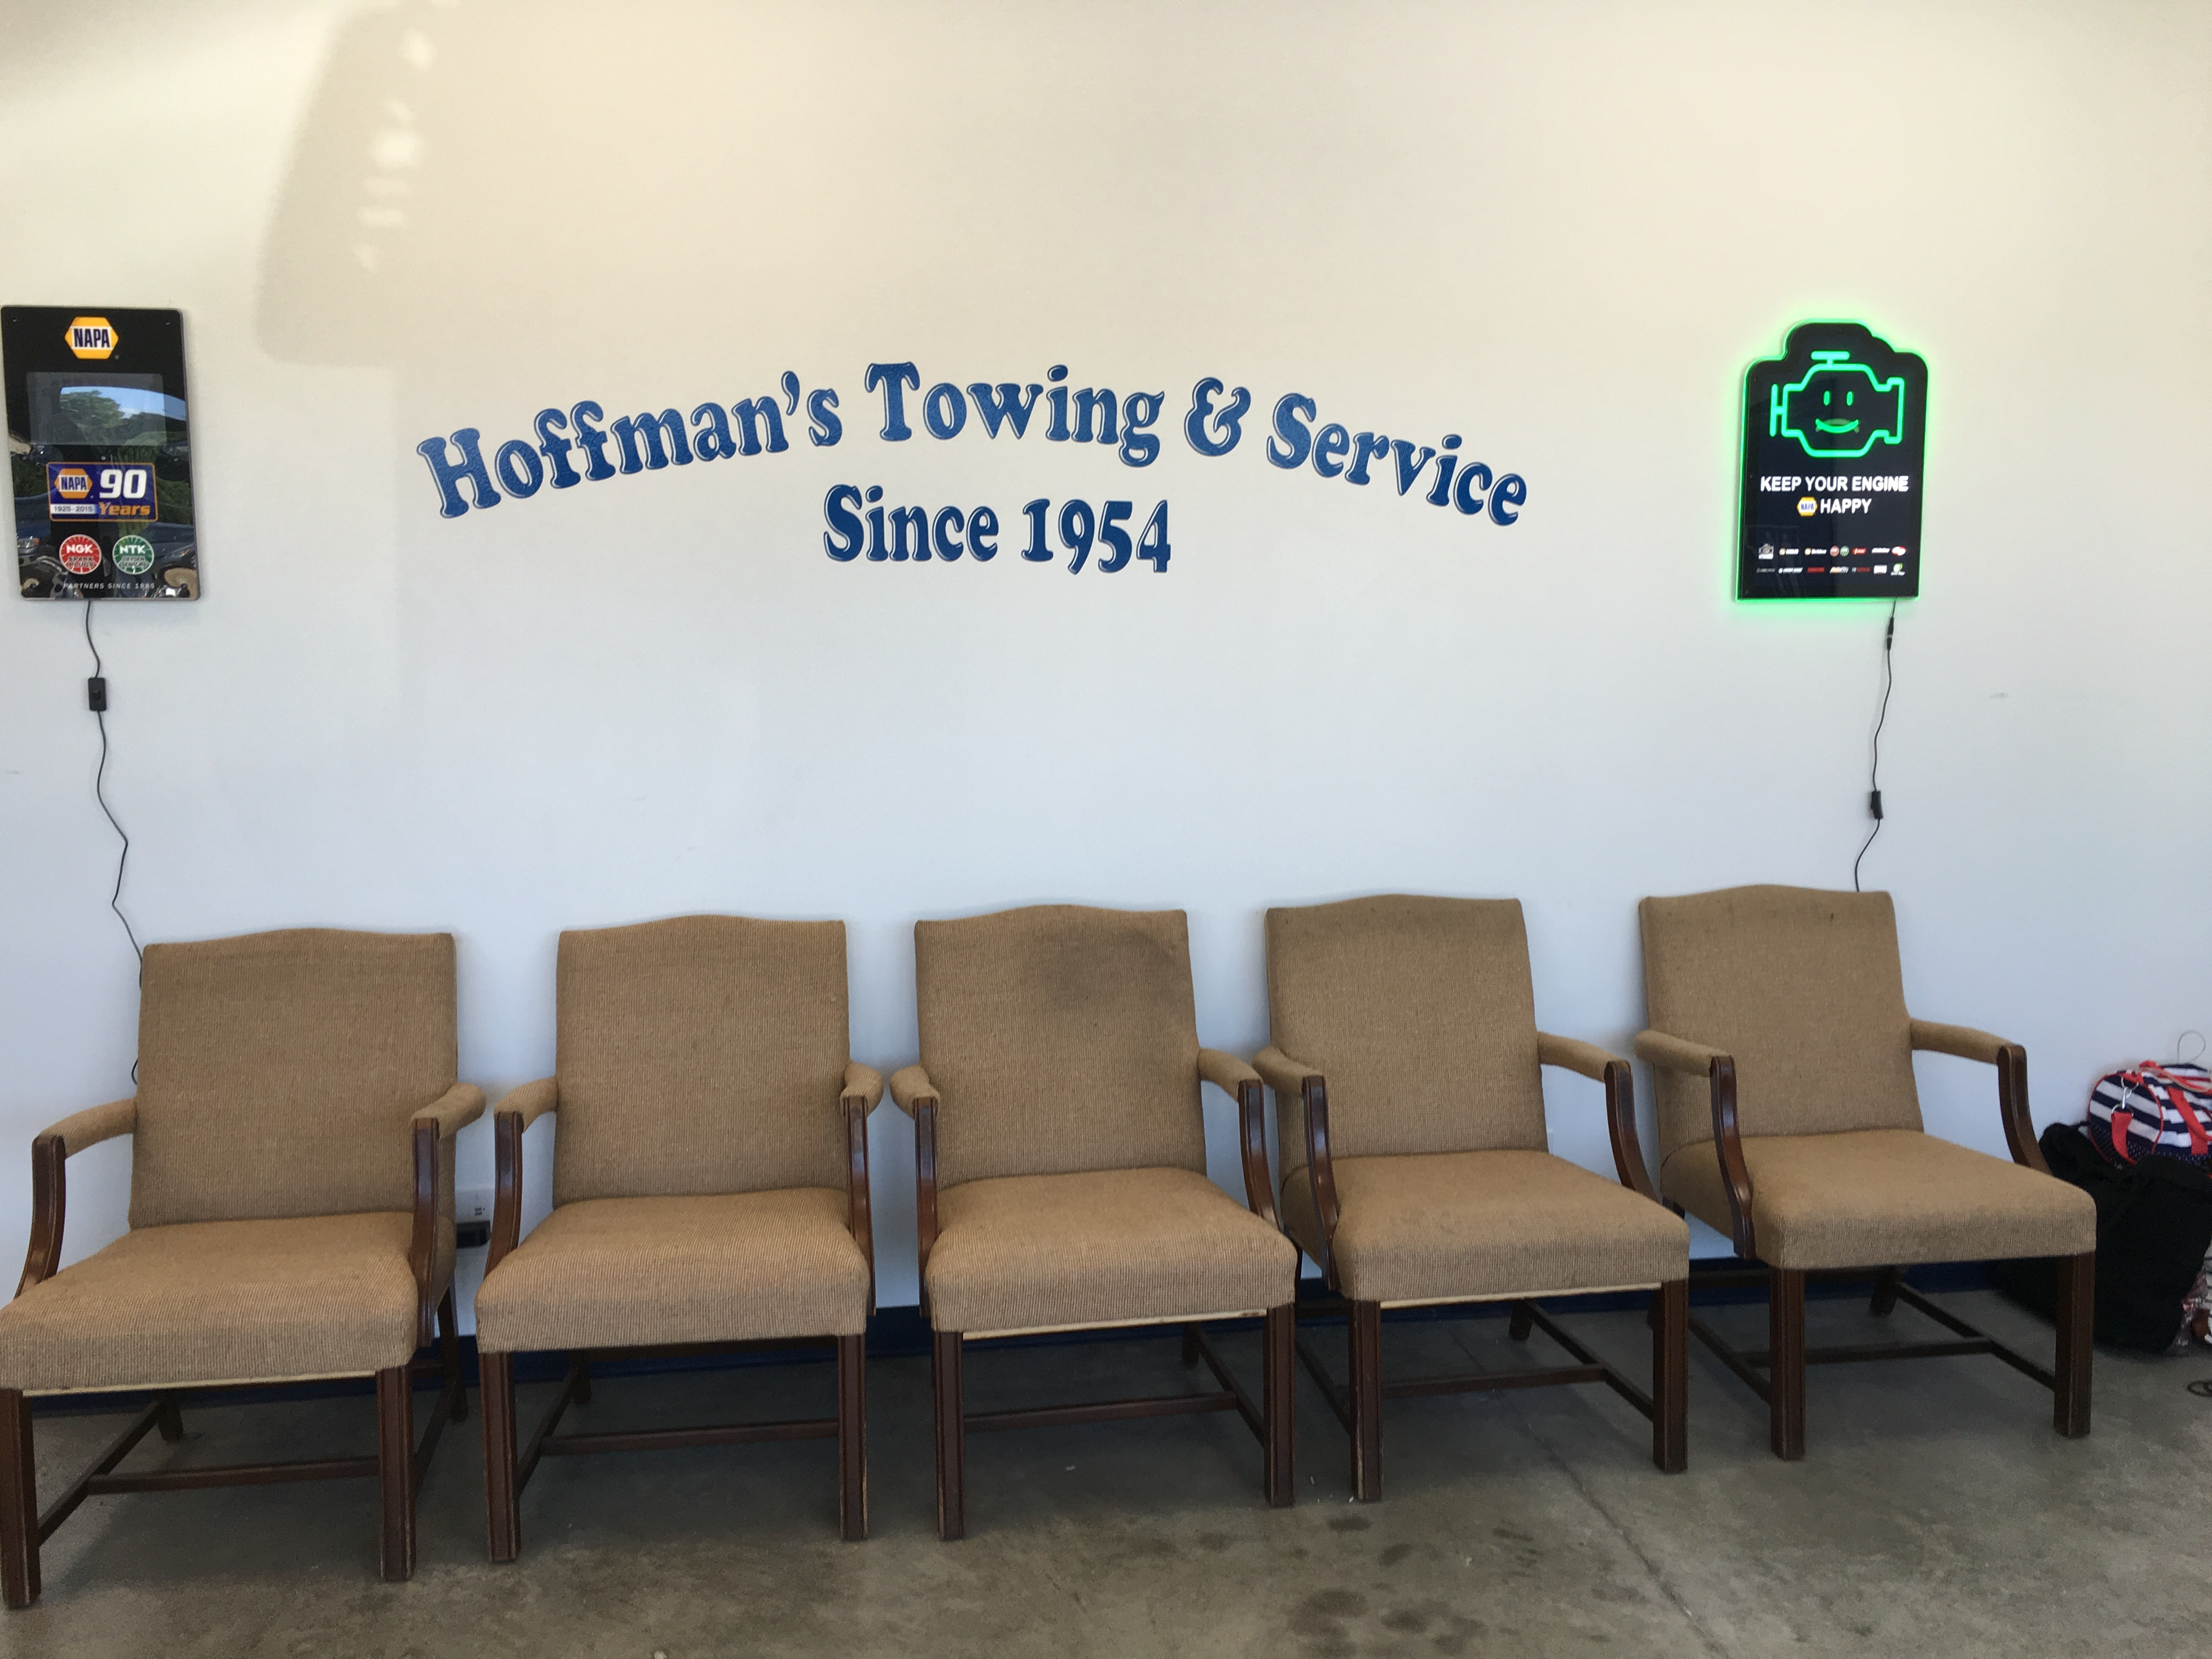 Hoffman's Towing & Service Inc image 2